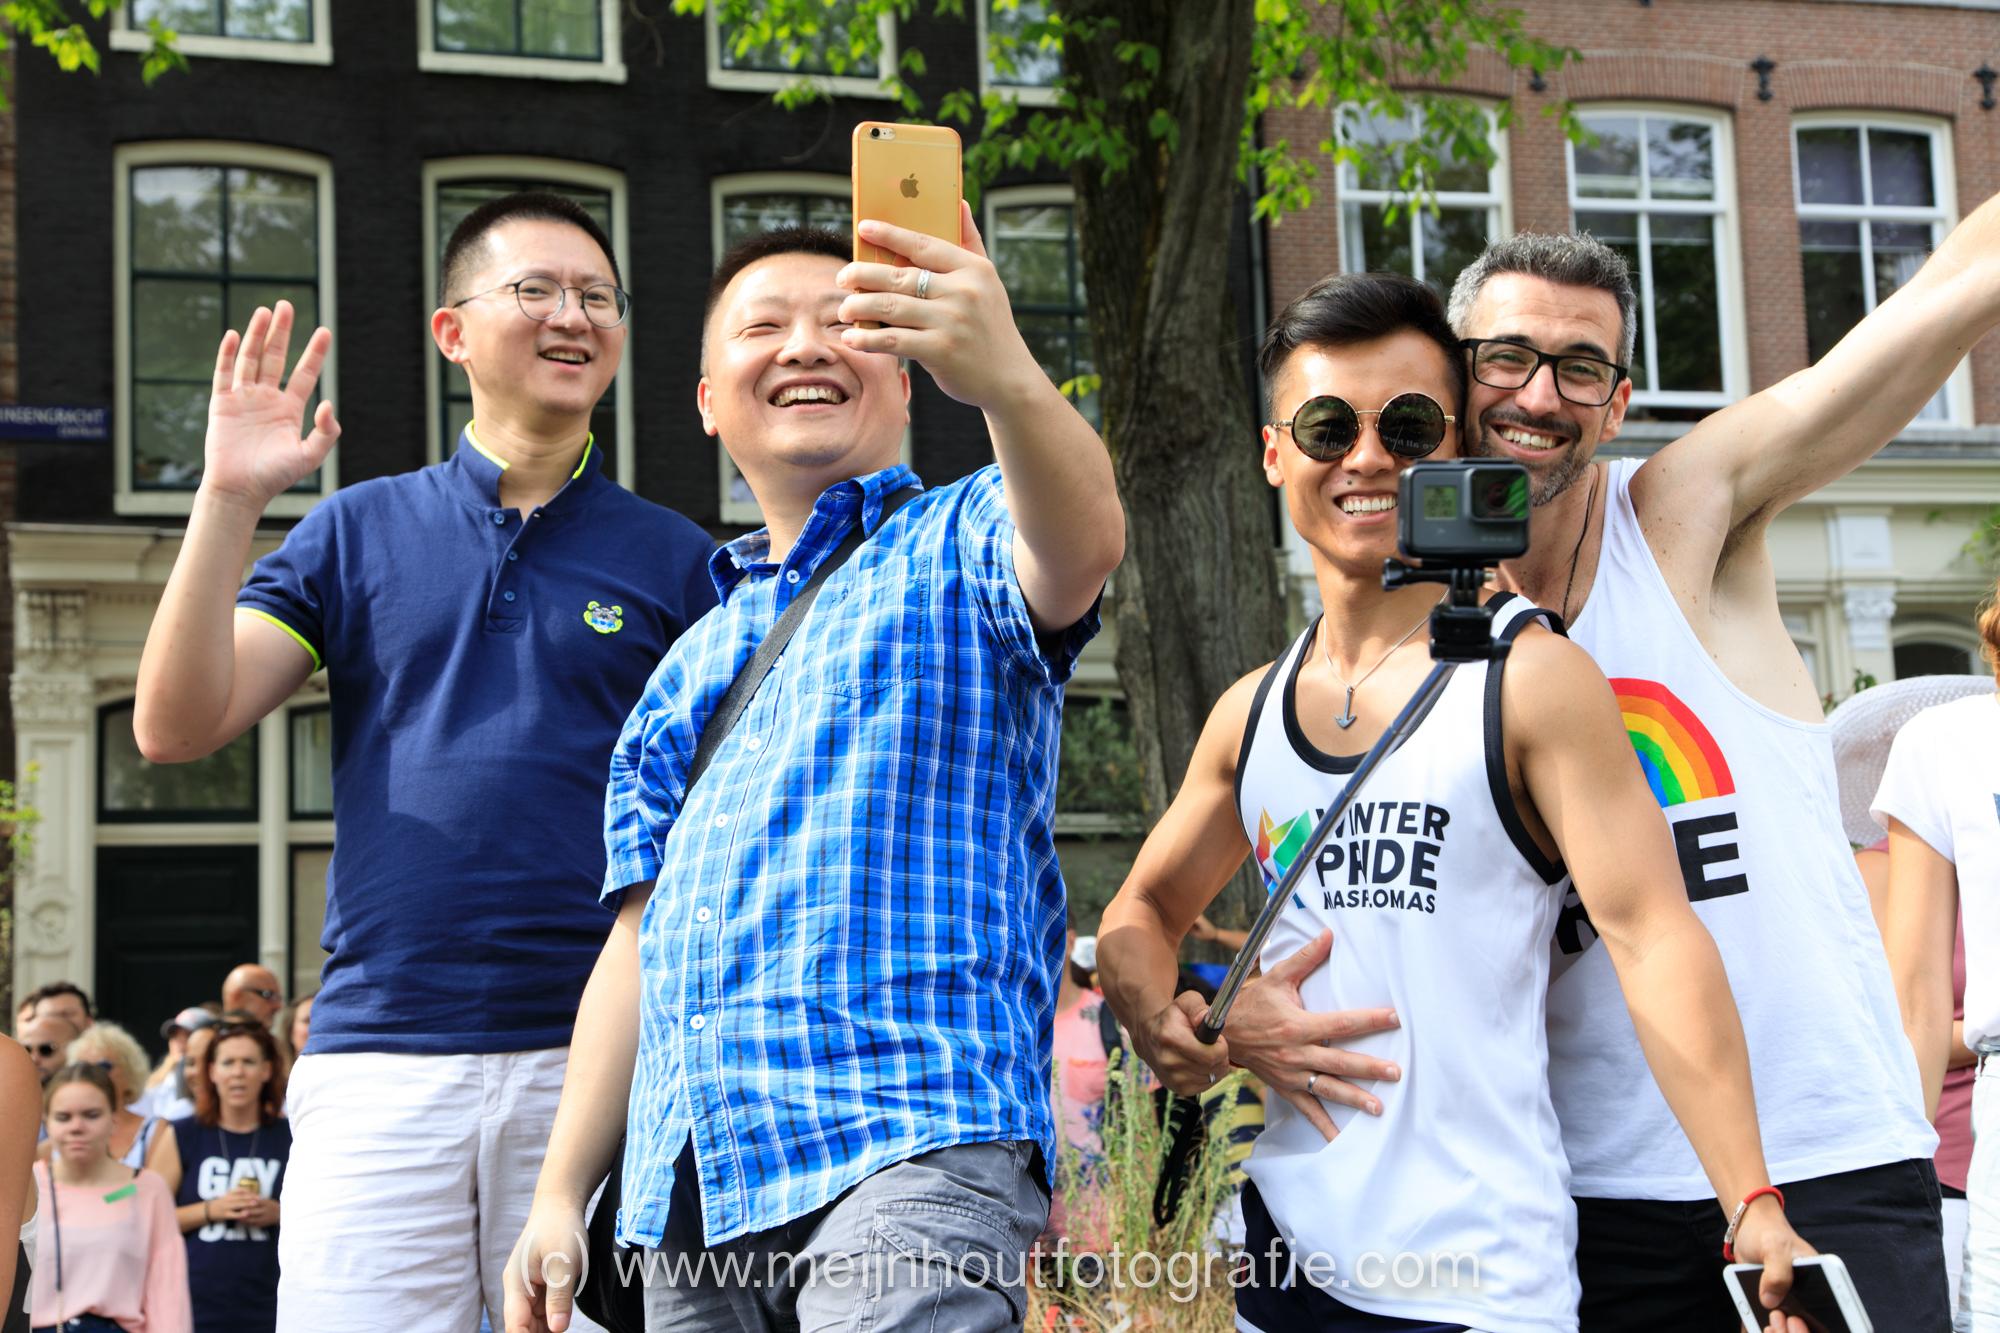 20180804-_MG_0501 Deloitte Gay Pride 2018.jpg